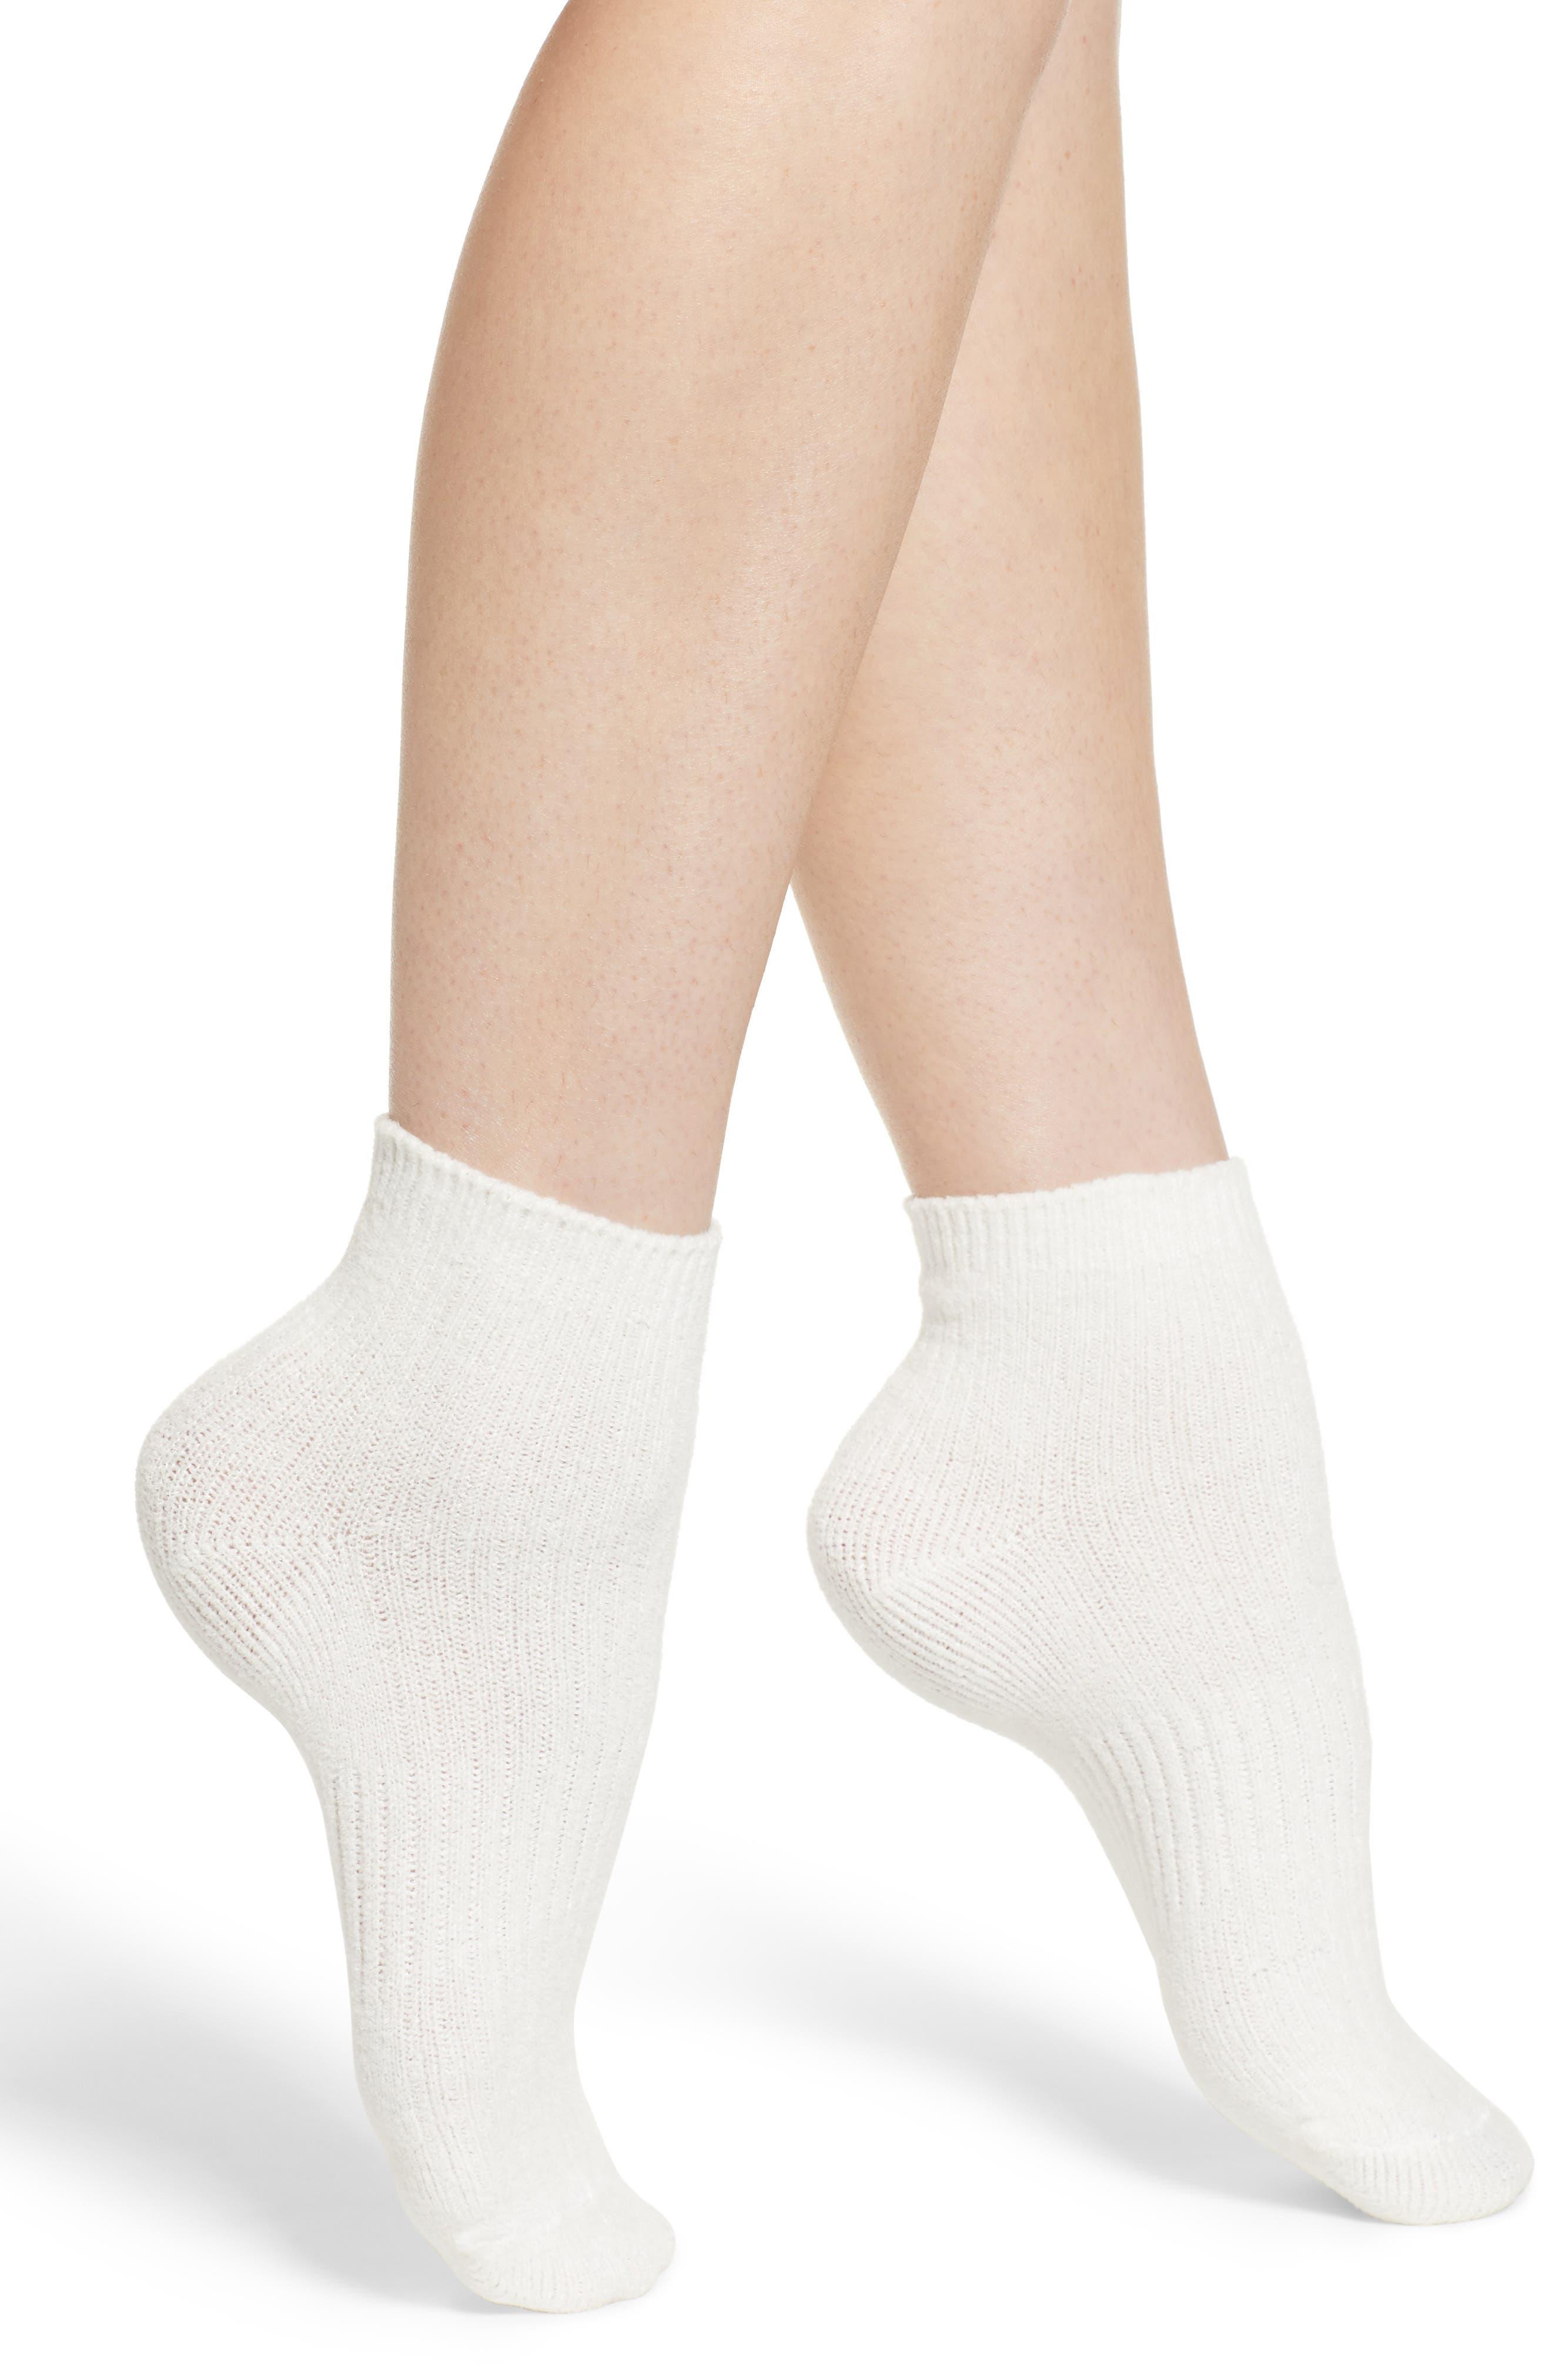 Butter Ankle Socks, Main, color, WHITE